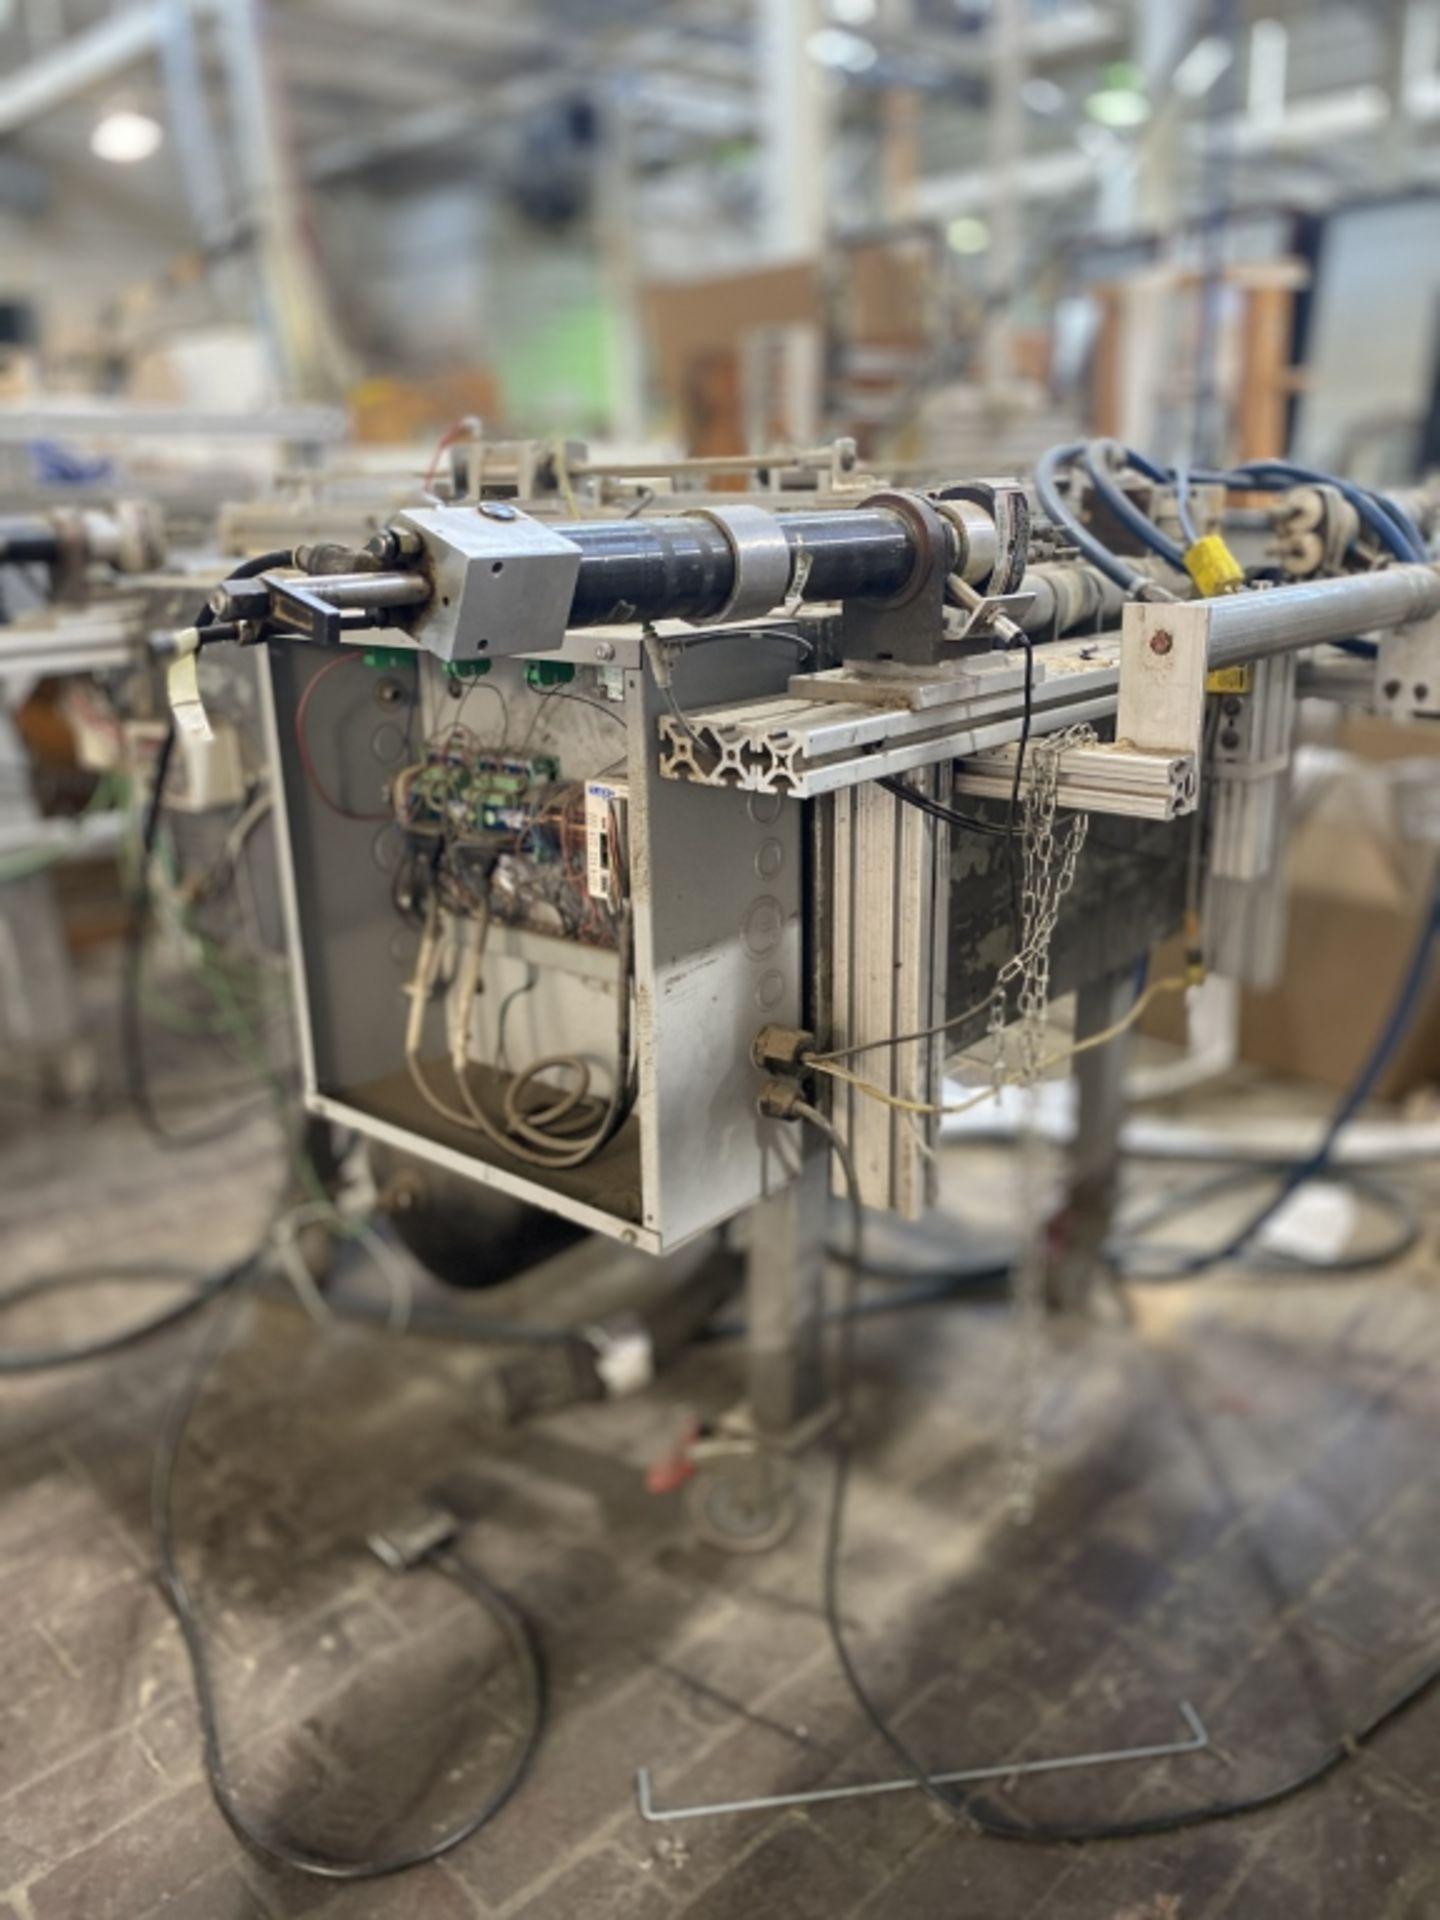 Lot 1041 - Custom Machine#1: Pilot Hole drill